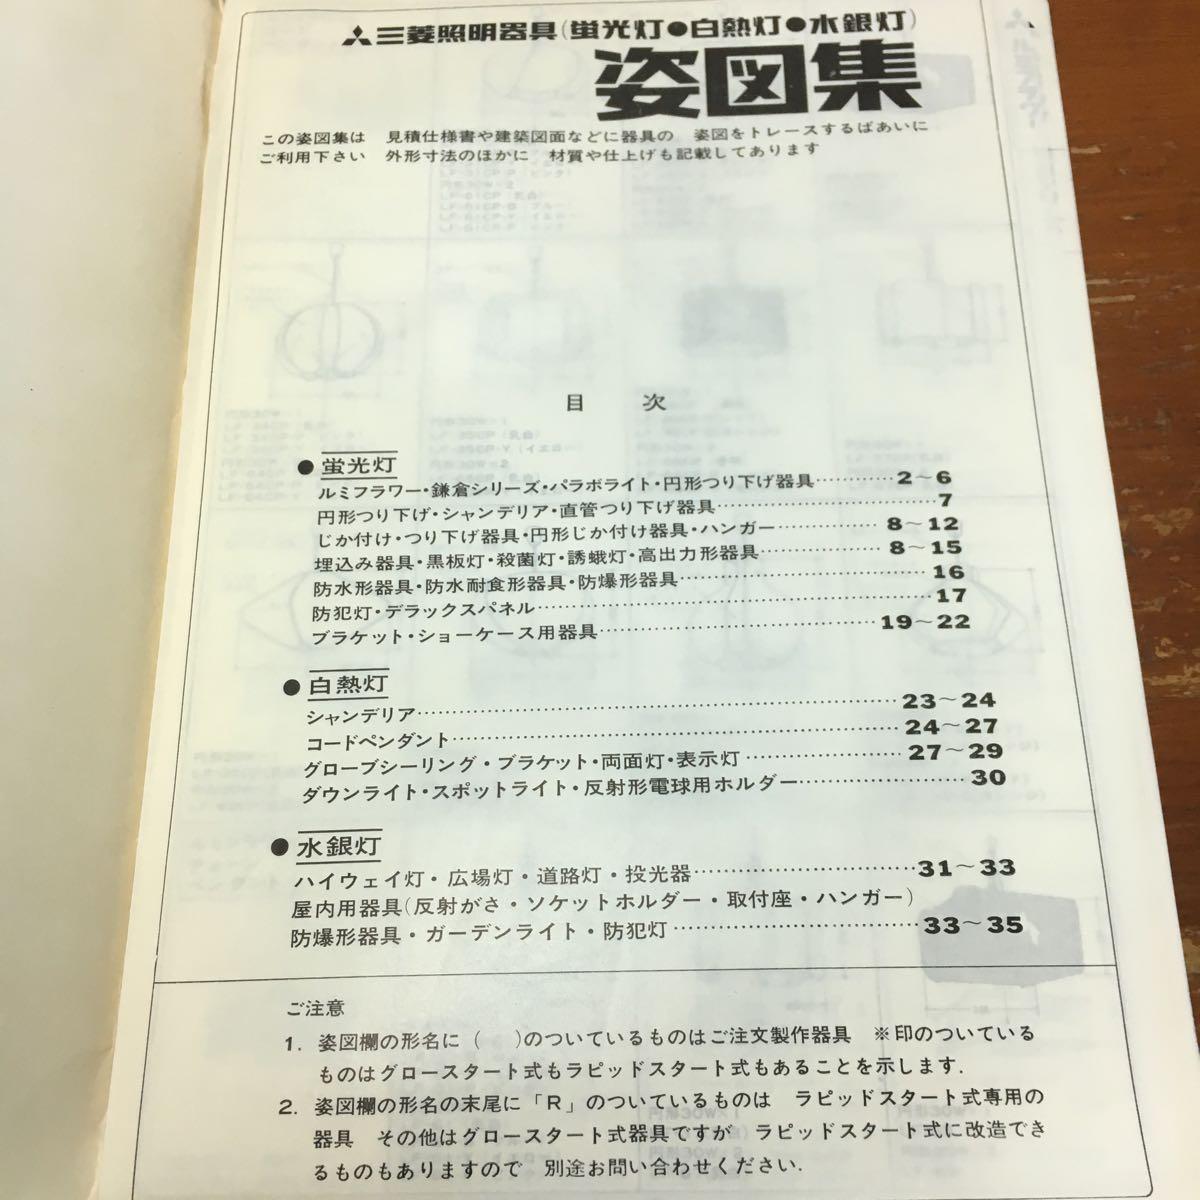 三菱照明器具/換気扇/カタログ/1971年・姿図集・照明器具技術編_画像5